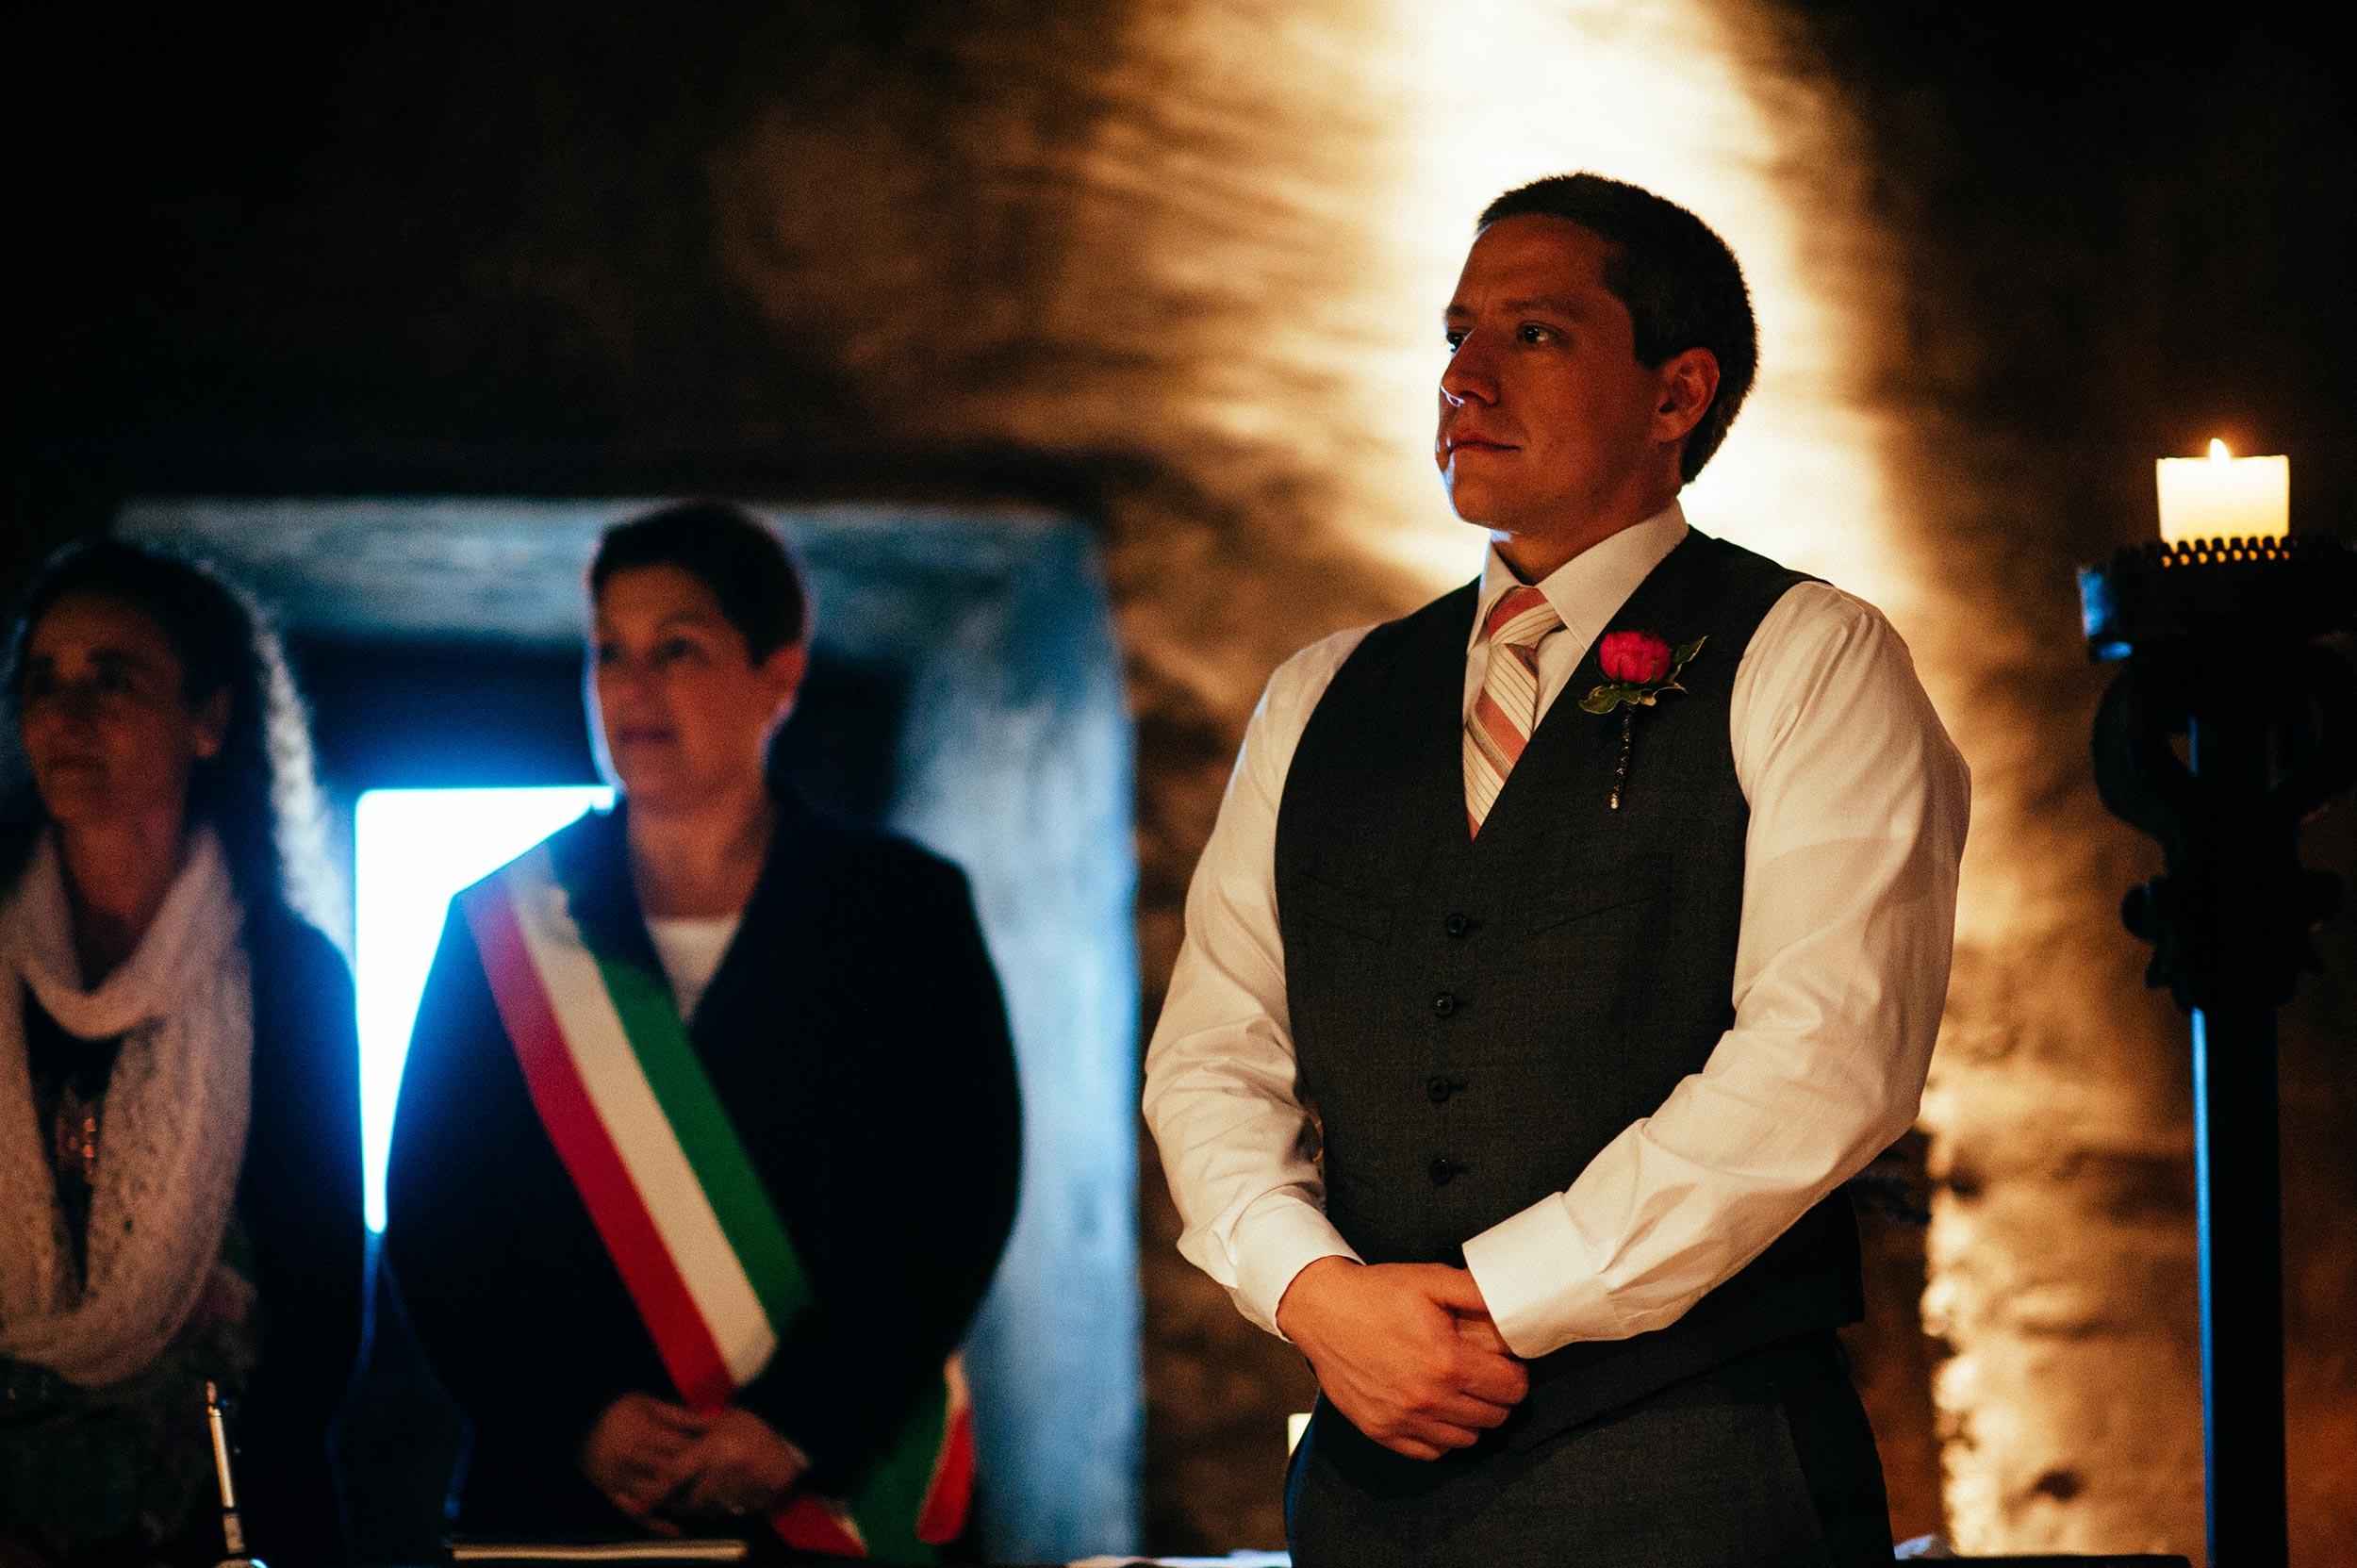 2014-Shelby-Jocelyn-Santo-Stefano-Di-Sessanio-Wedding-Photographer-Italy-Alessandro-Avenali-28.jpg